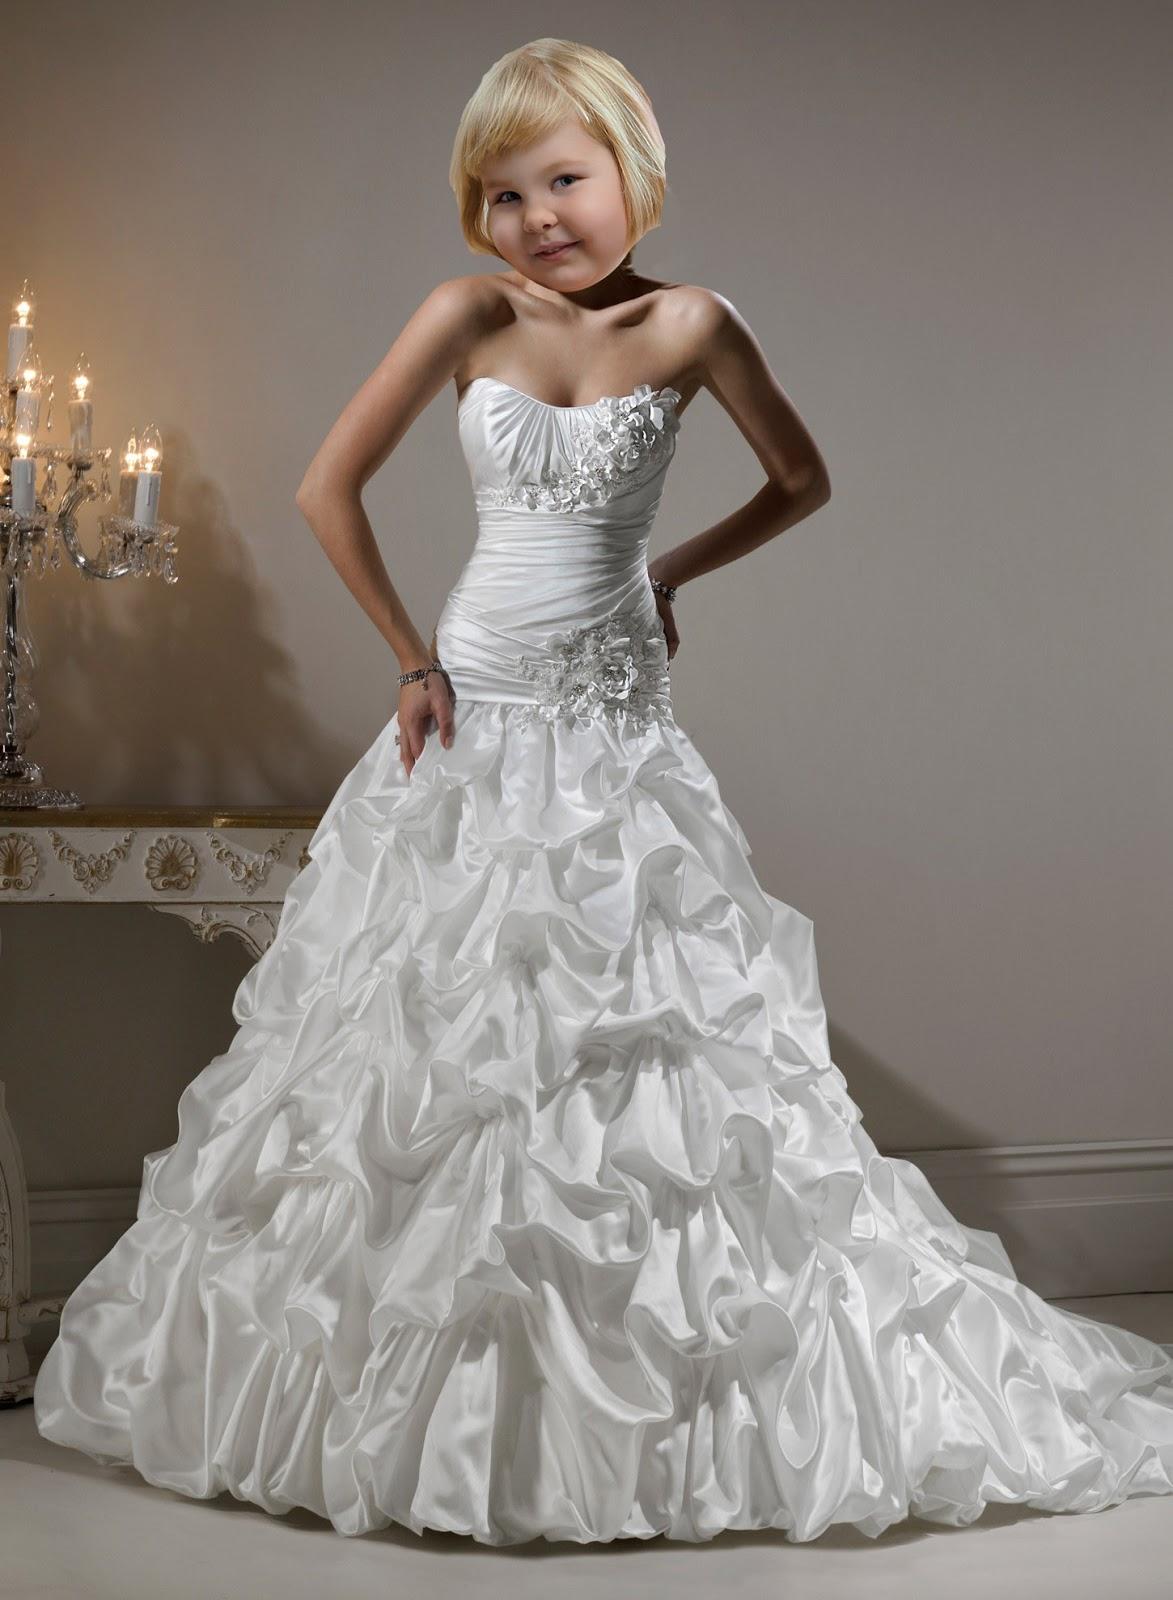 Prada Wedding Dress | Babies Where They Should Not Be